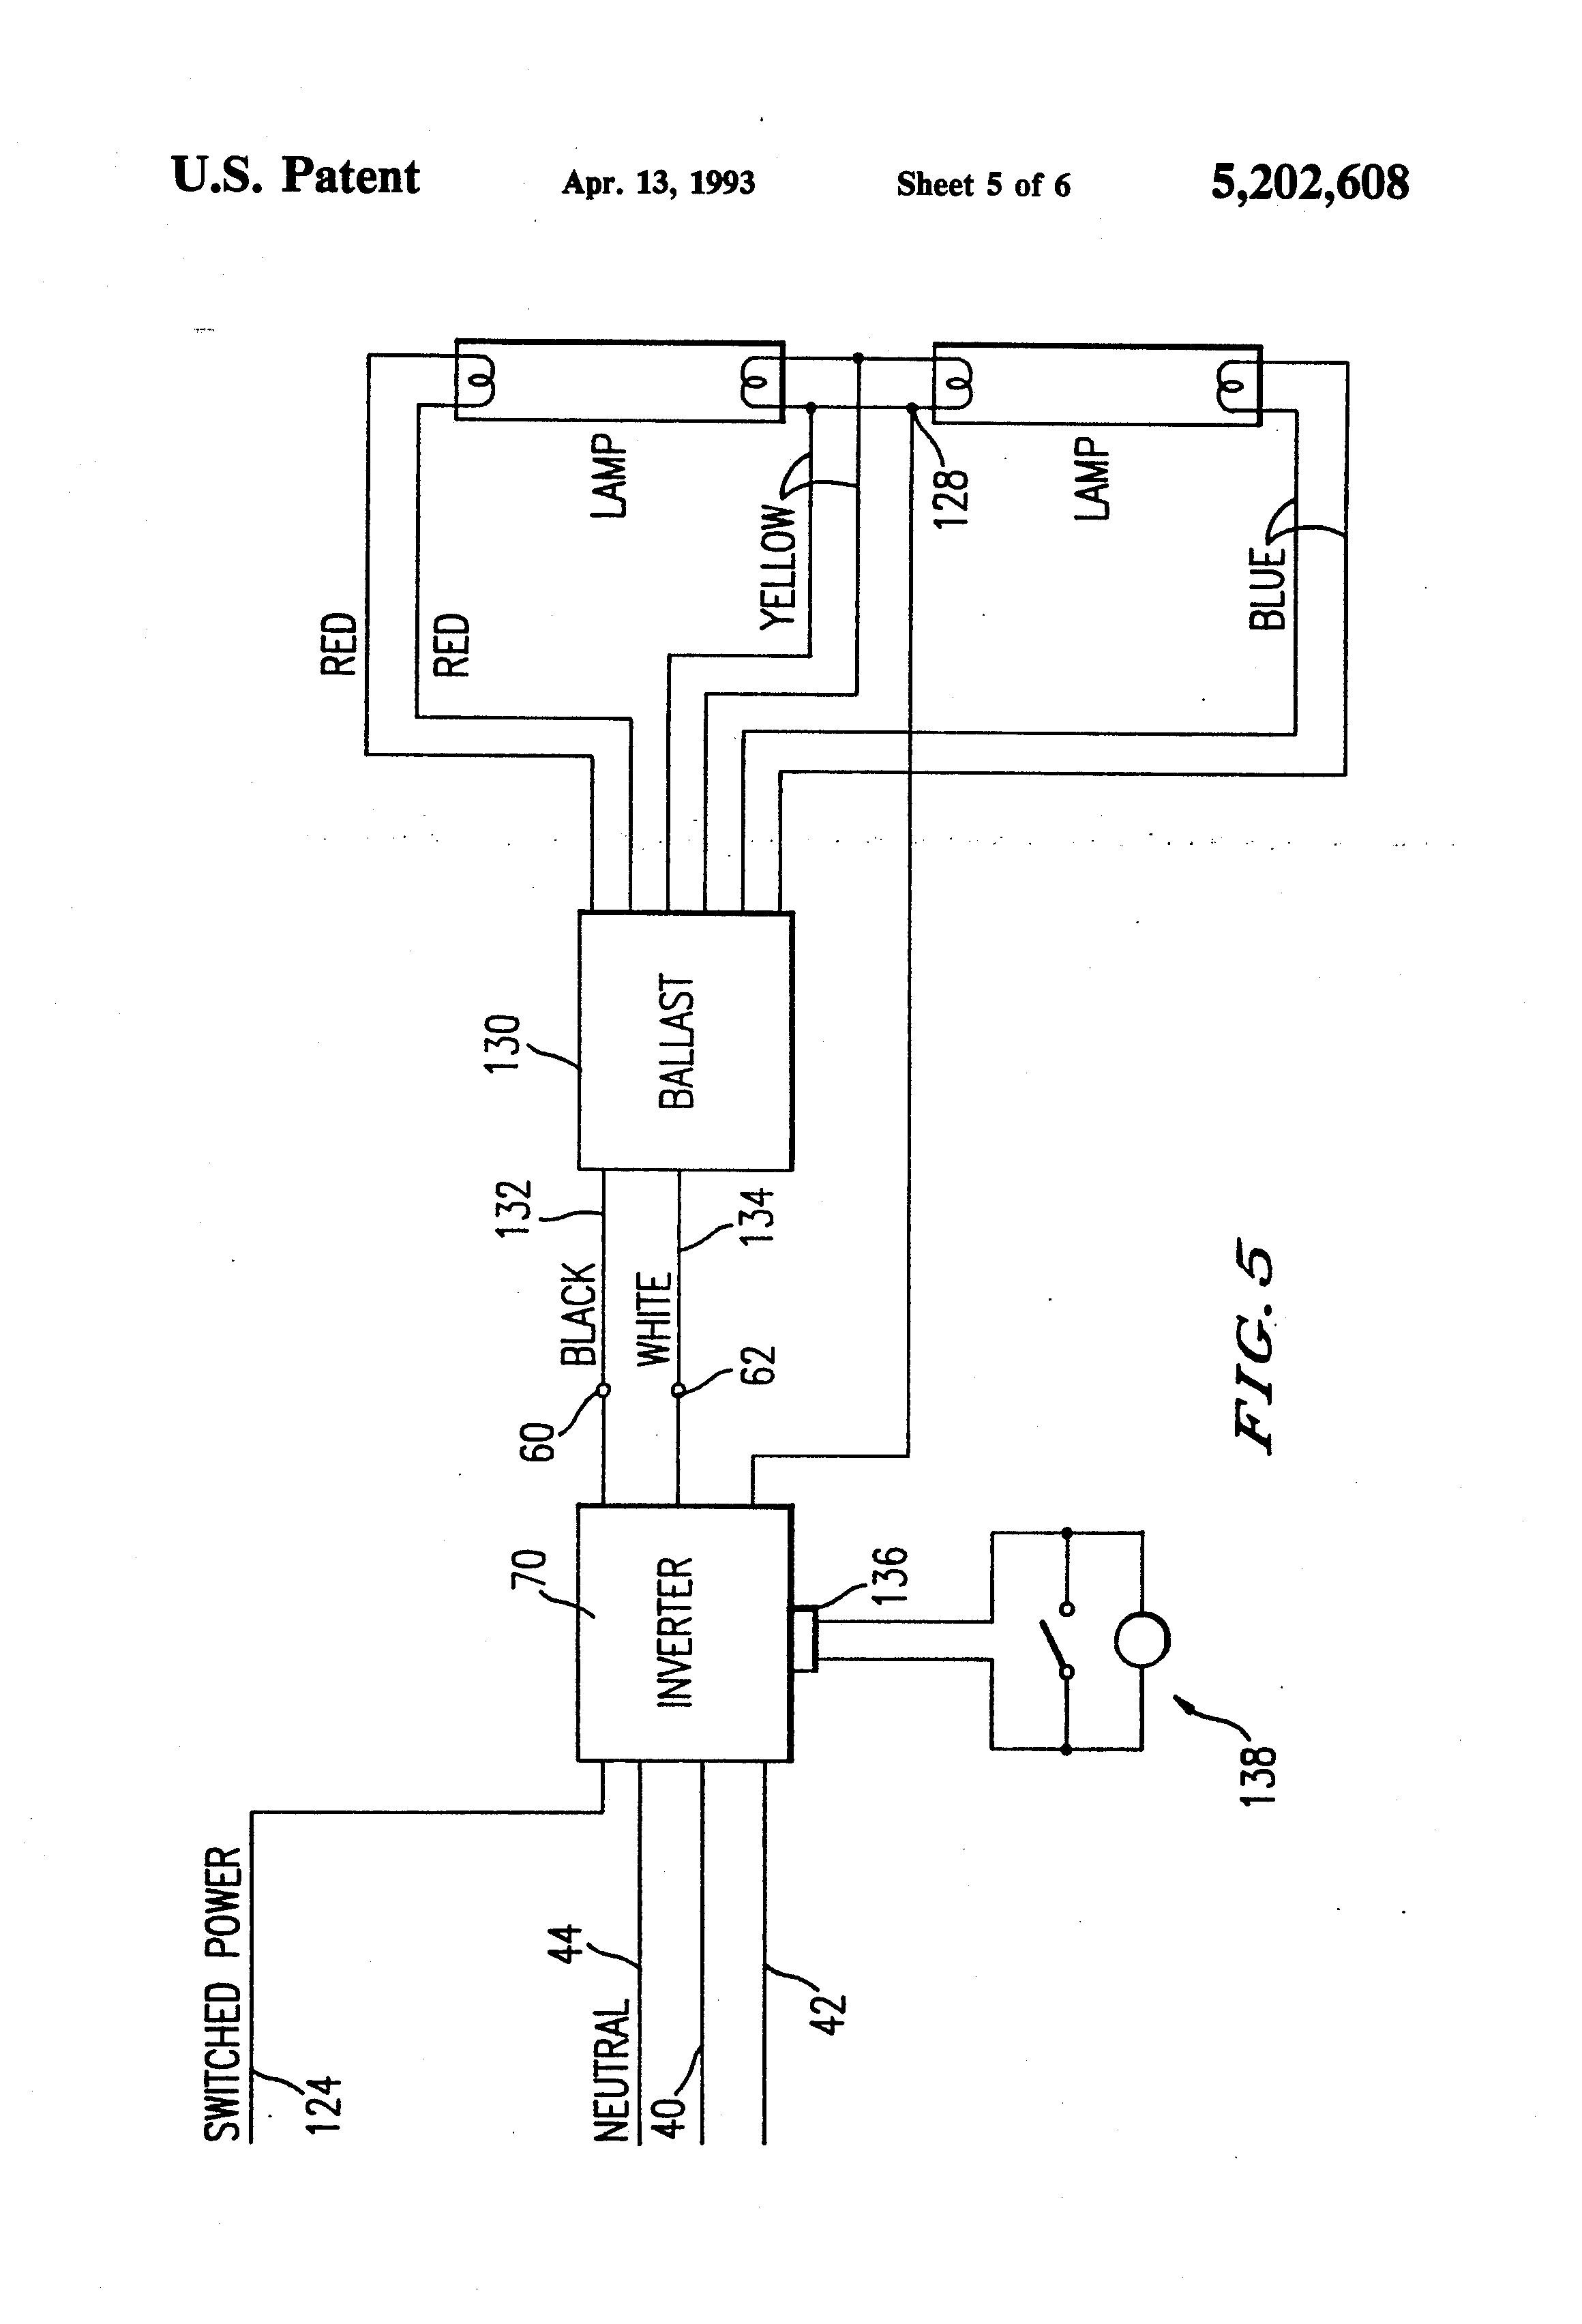 Idec Sh2B 05 Wiring Diagram from i0.wp.com